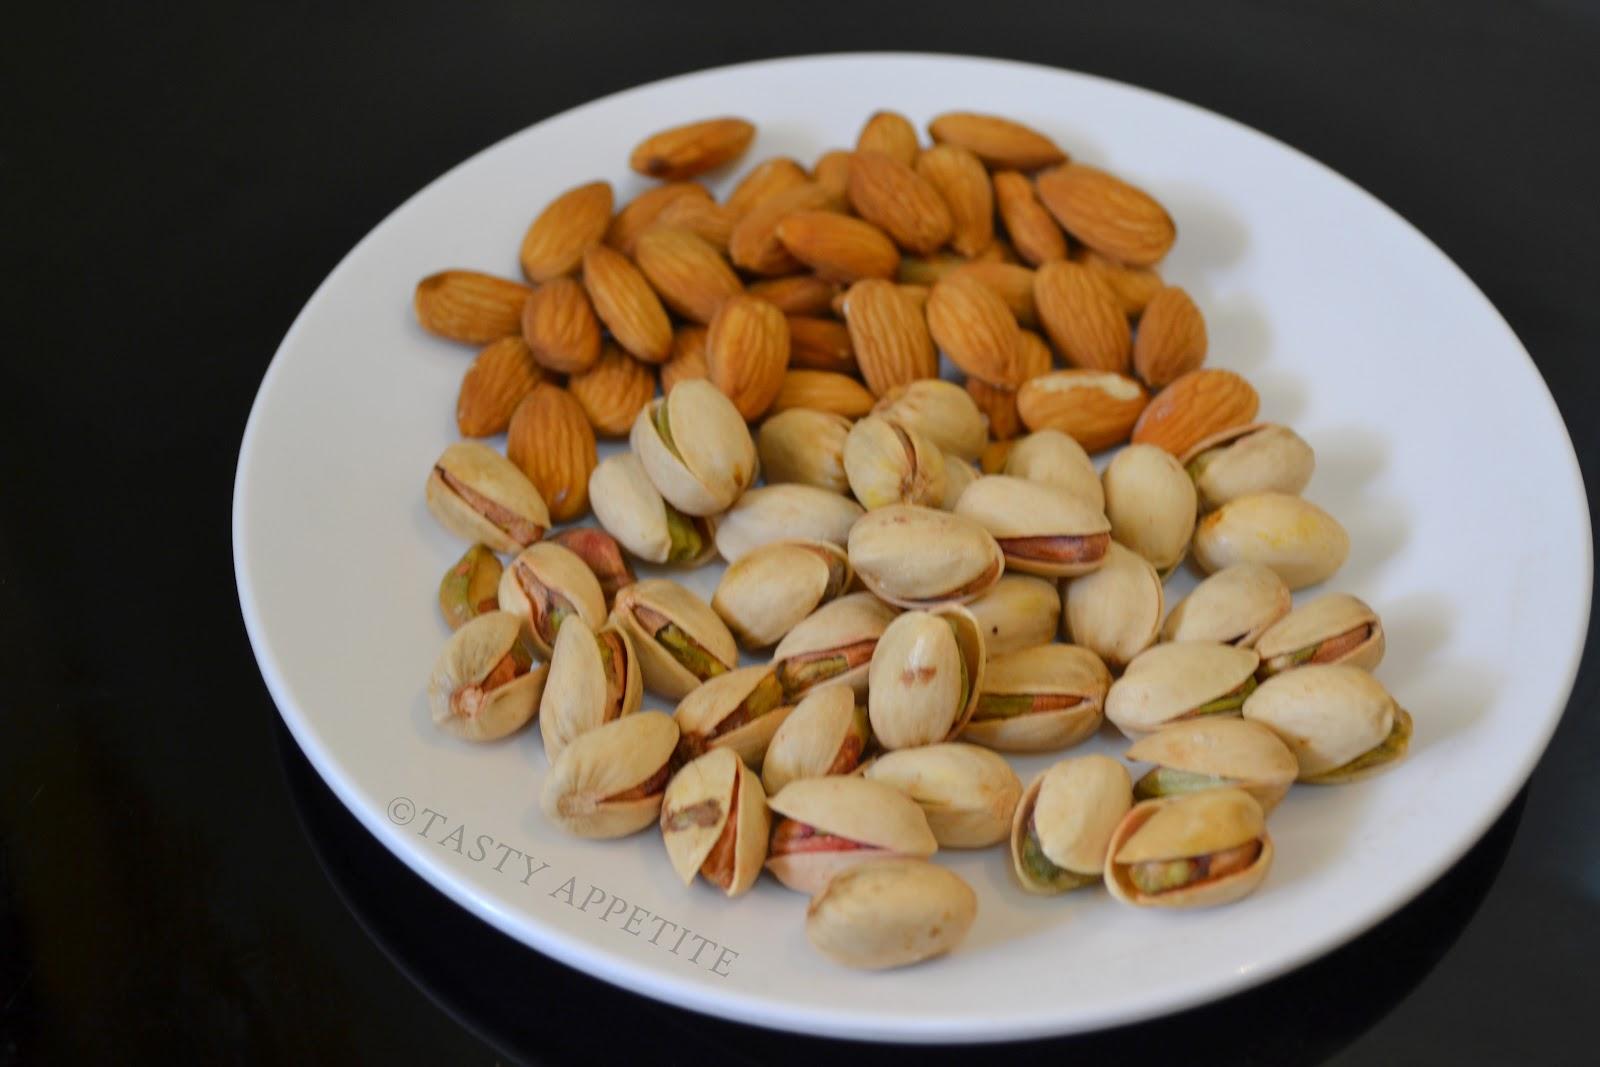 how to prepare rasmalai in home